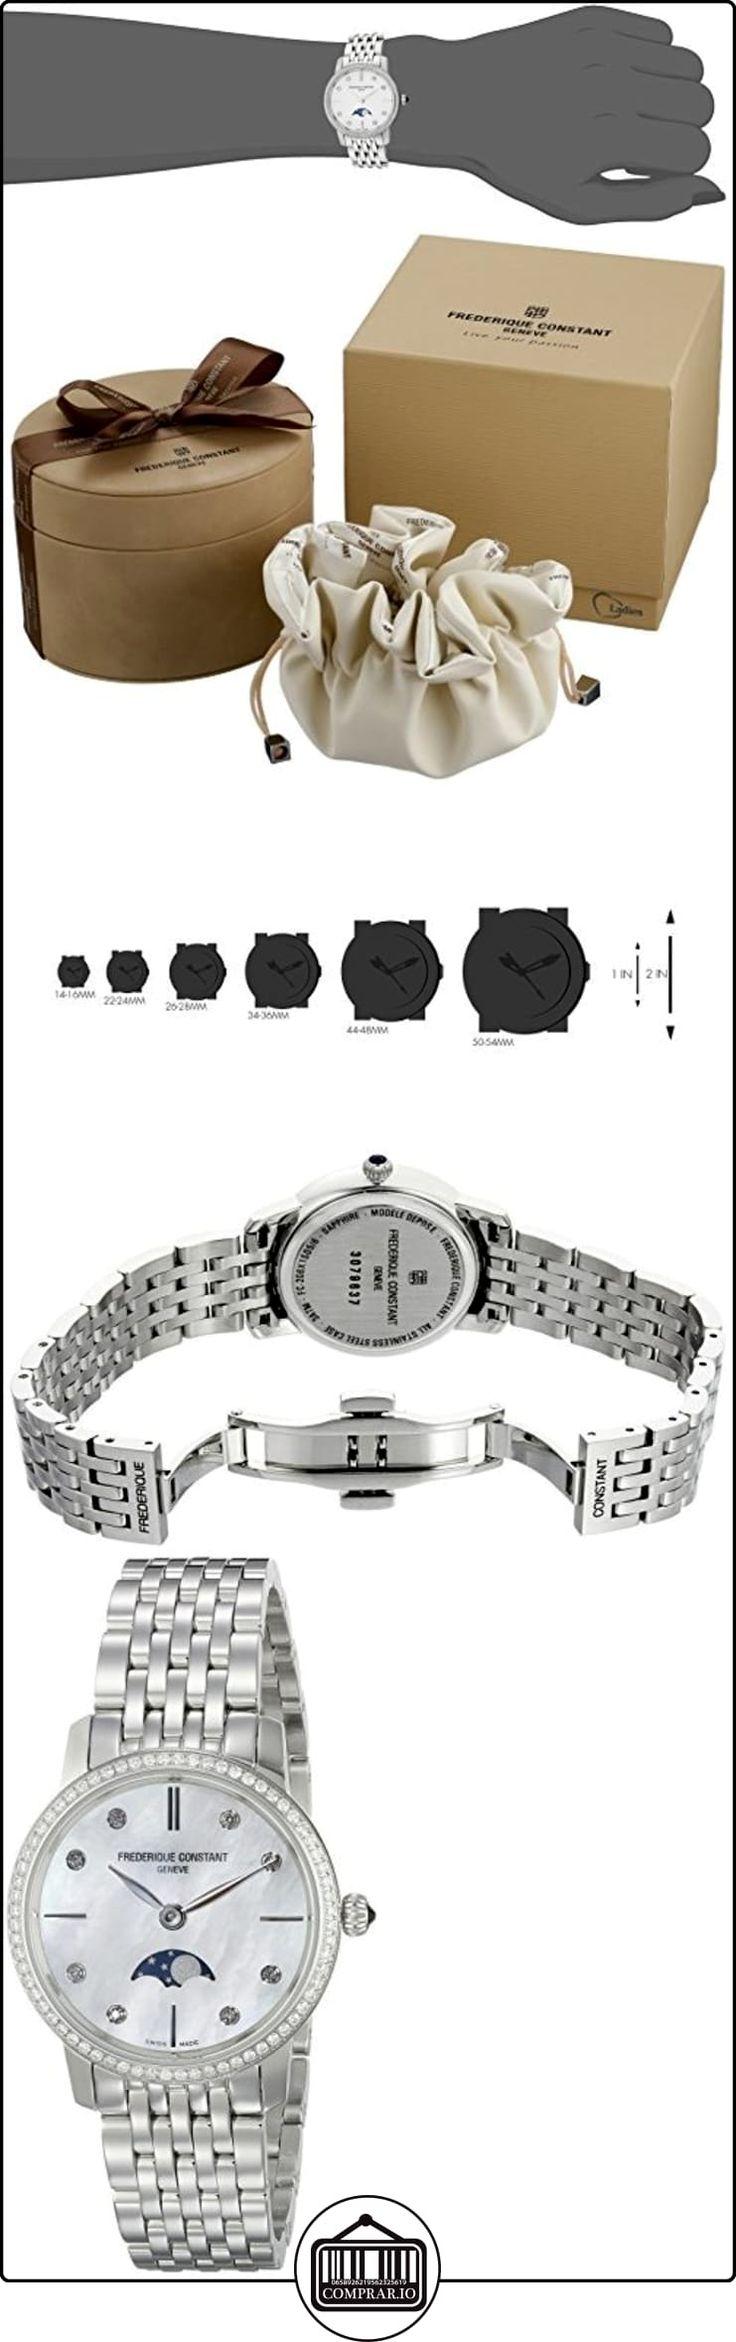 Reloj-Frederique Constant-para Mujer-FC-206MPWD1SD6B  ✿ Relojes para mujer - (Lujo) ✿